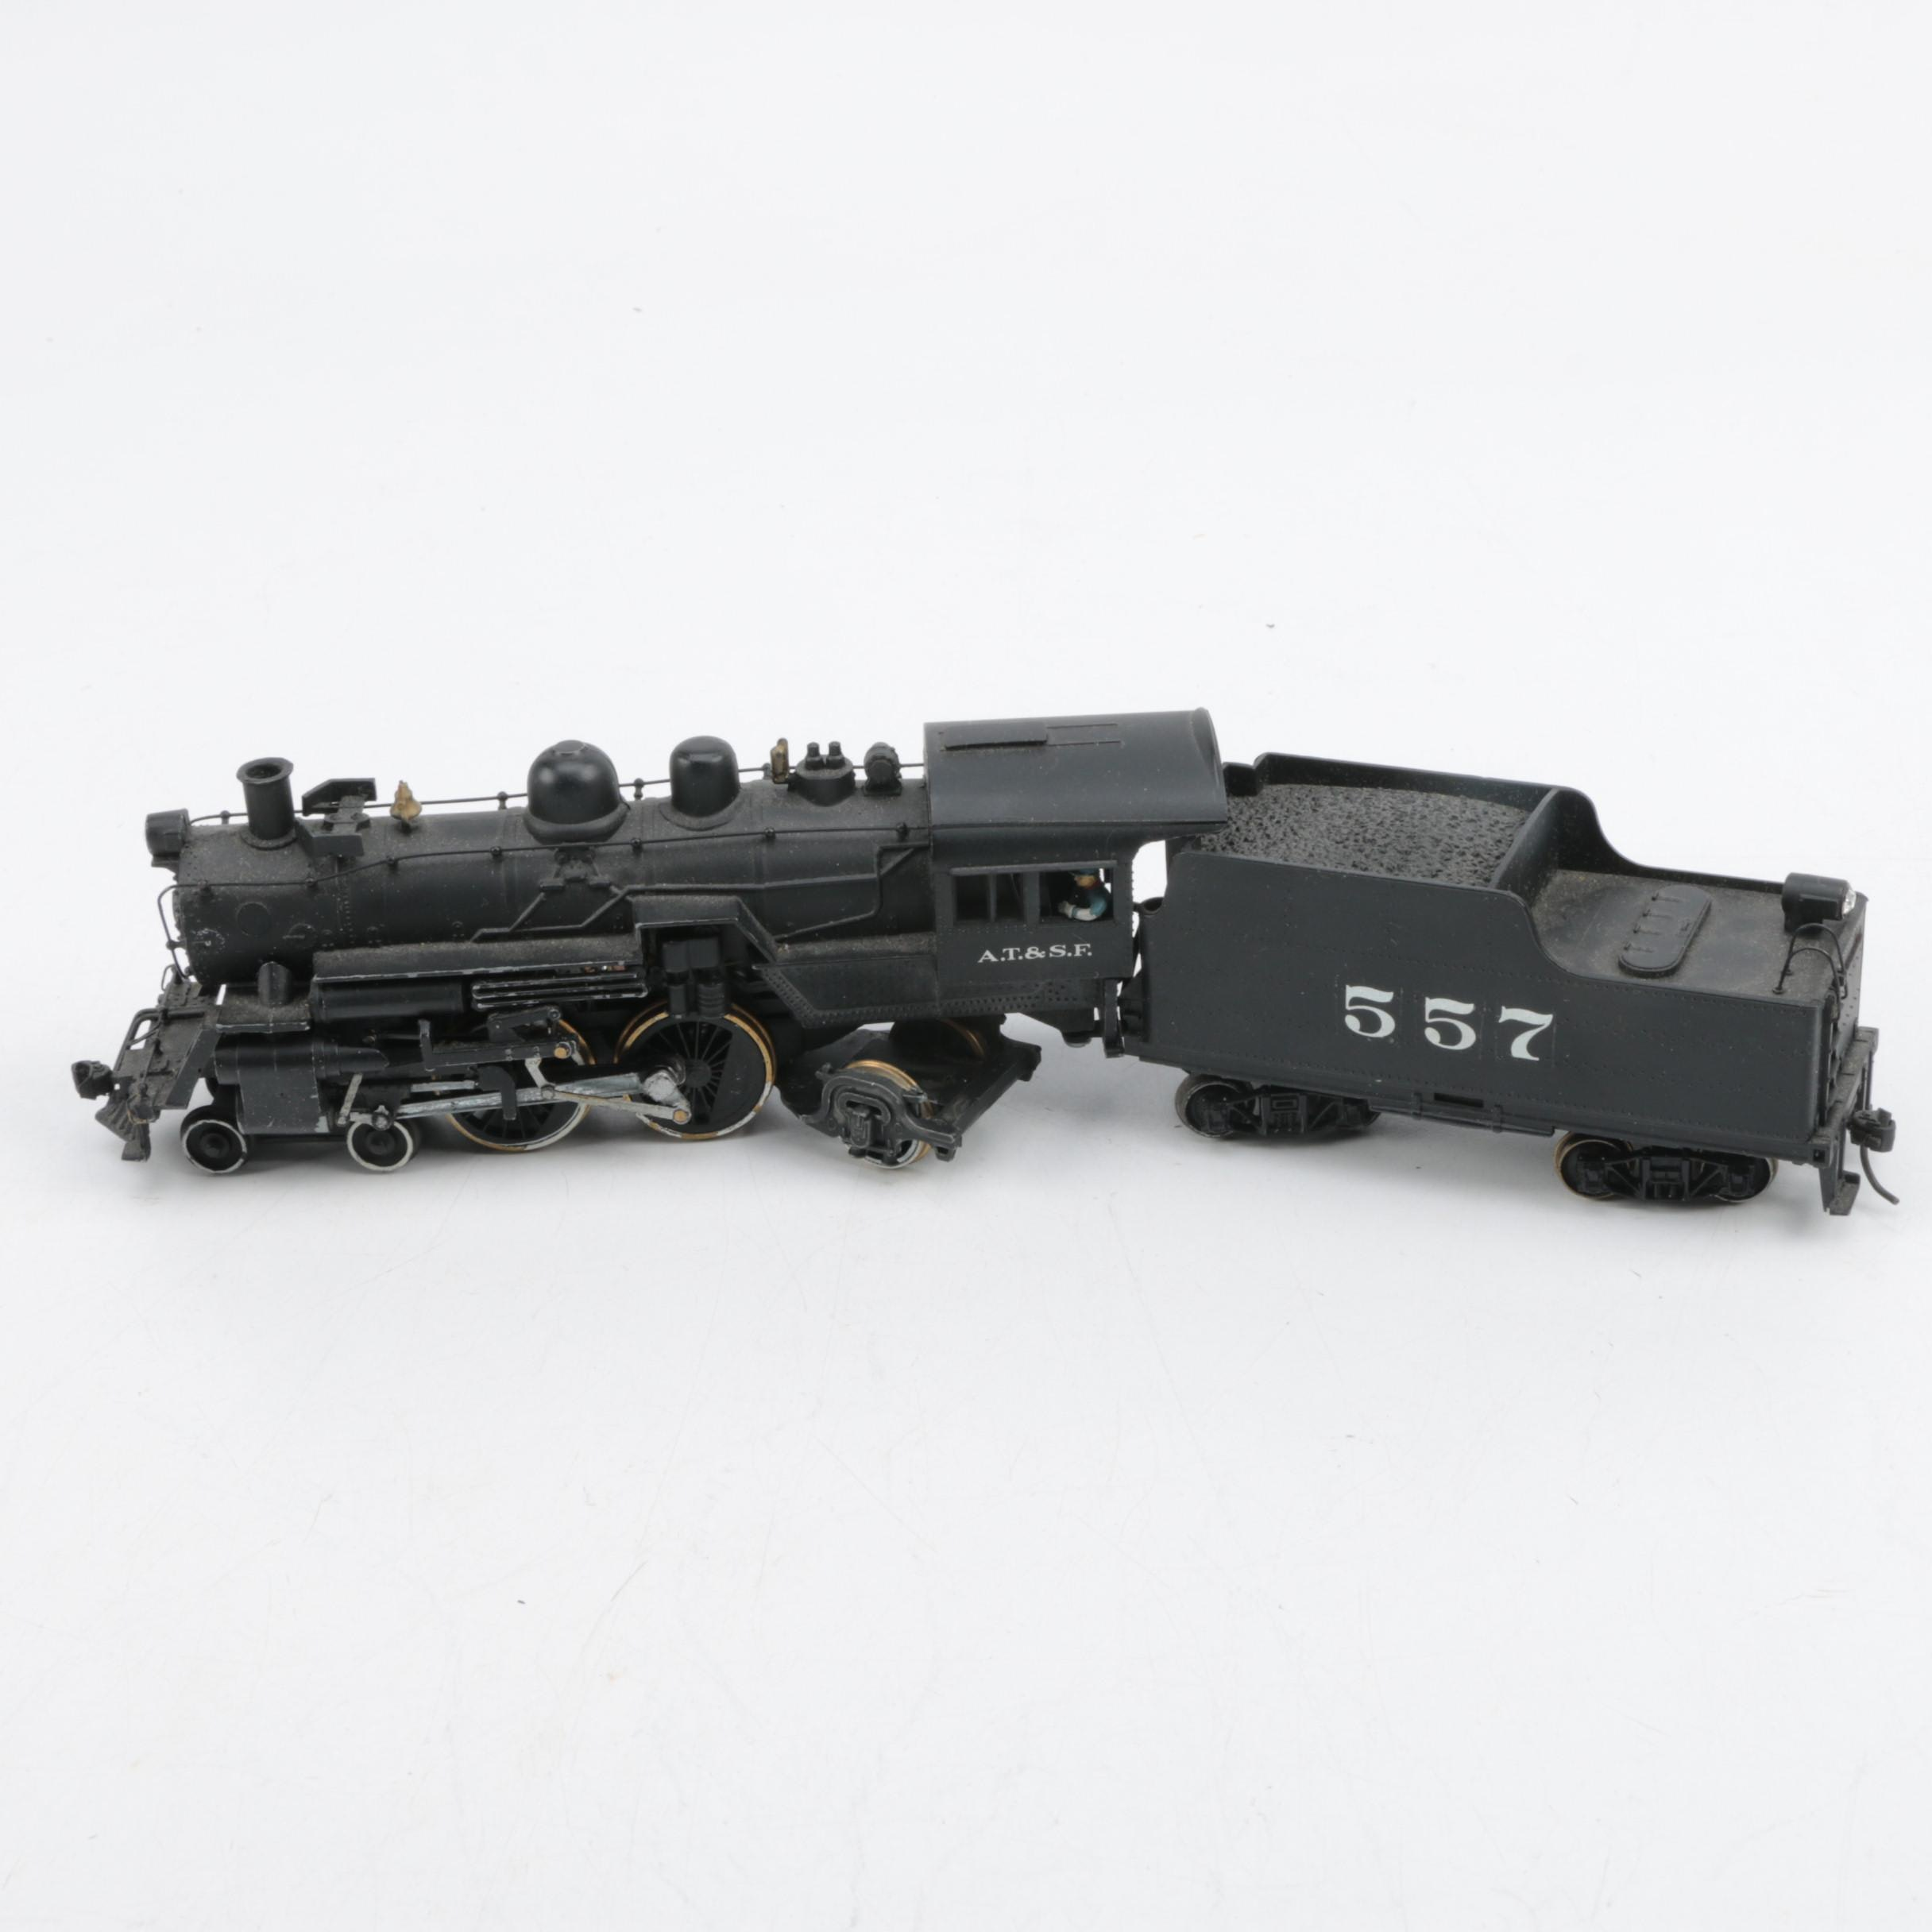 Hallmark Models A.T. & S.F. Steam Locomotive with Tender